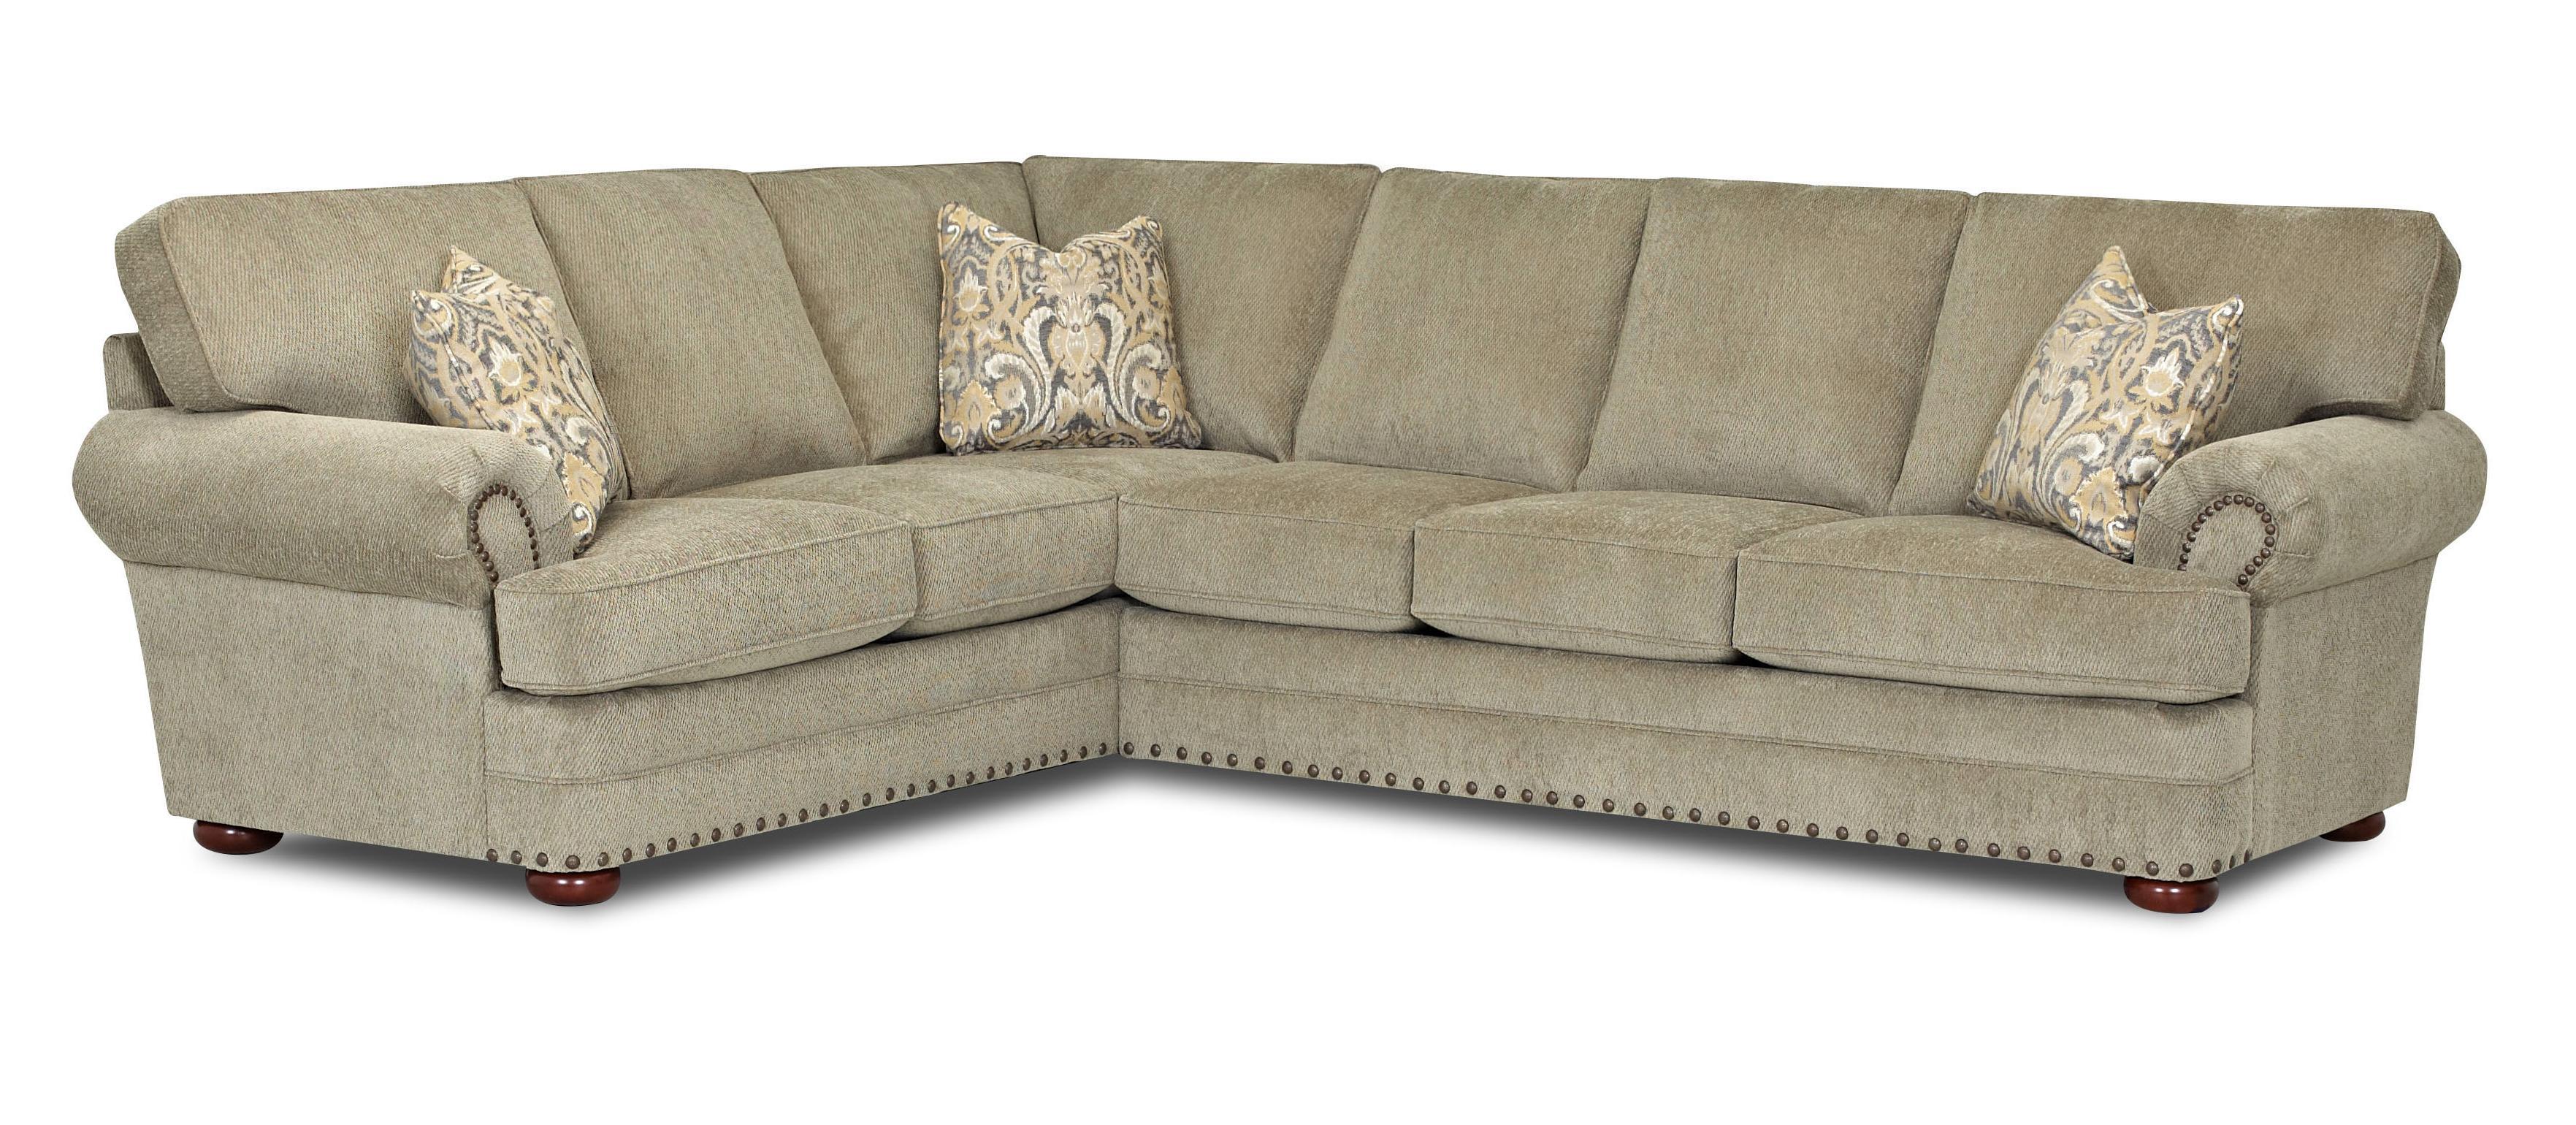 Traditioanl 2 Sectional Sofa